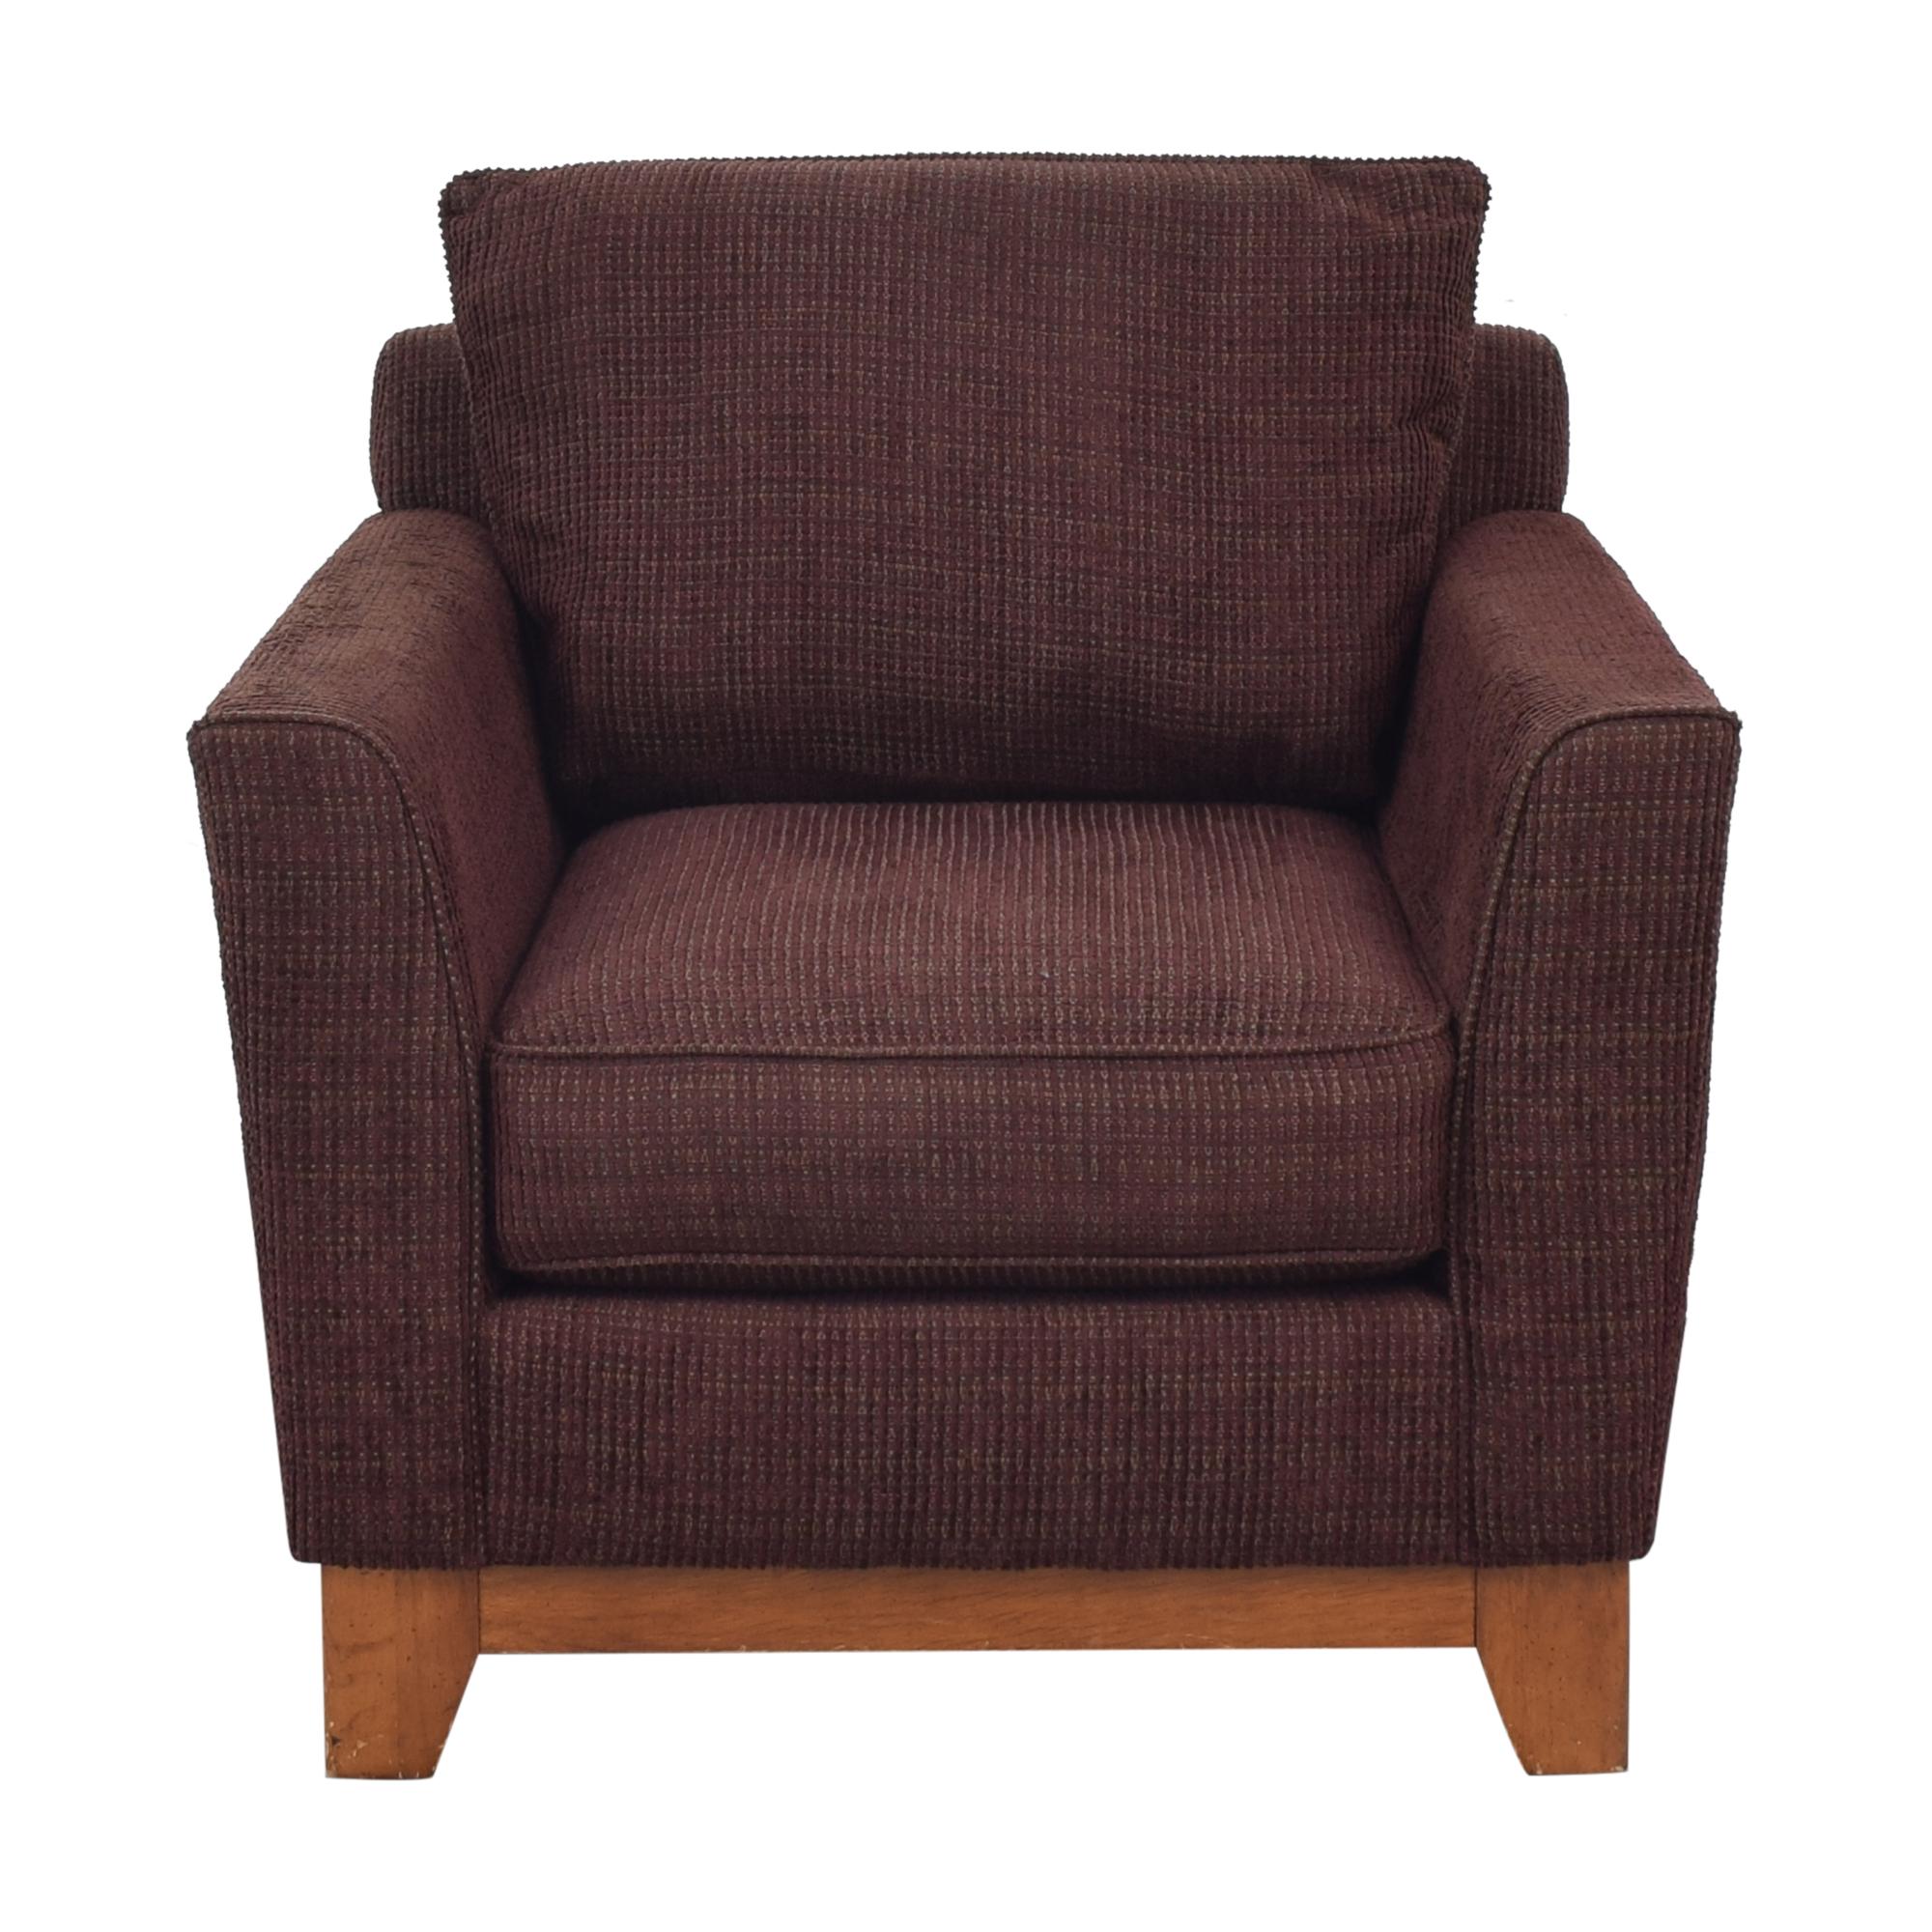 buy Bauhaus Furniture Upholstered Arm Chair Bauhaus Furniture Accent Chairs